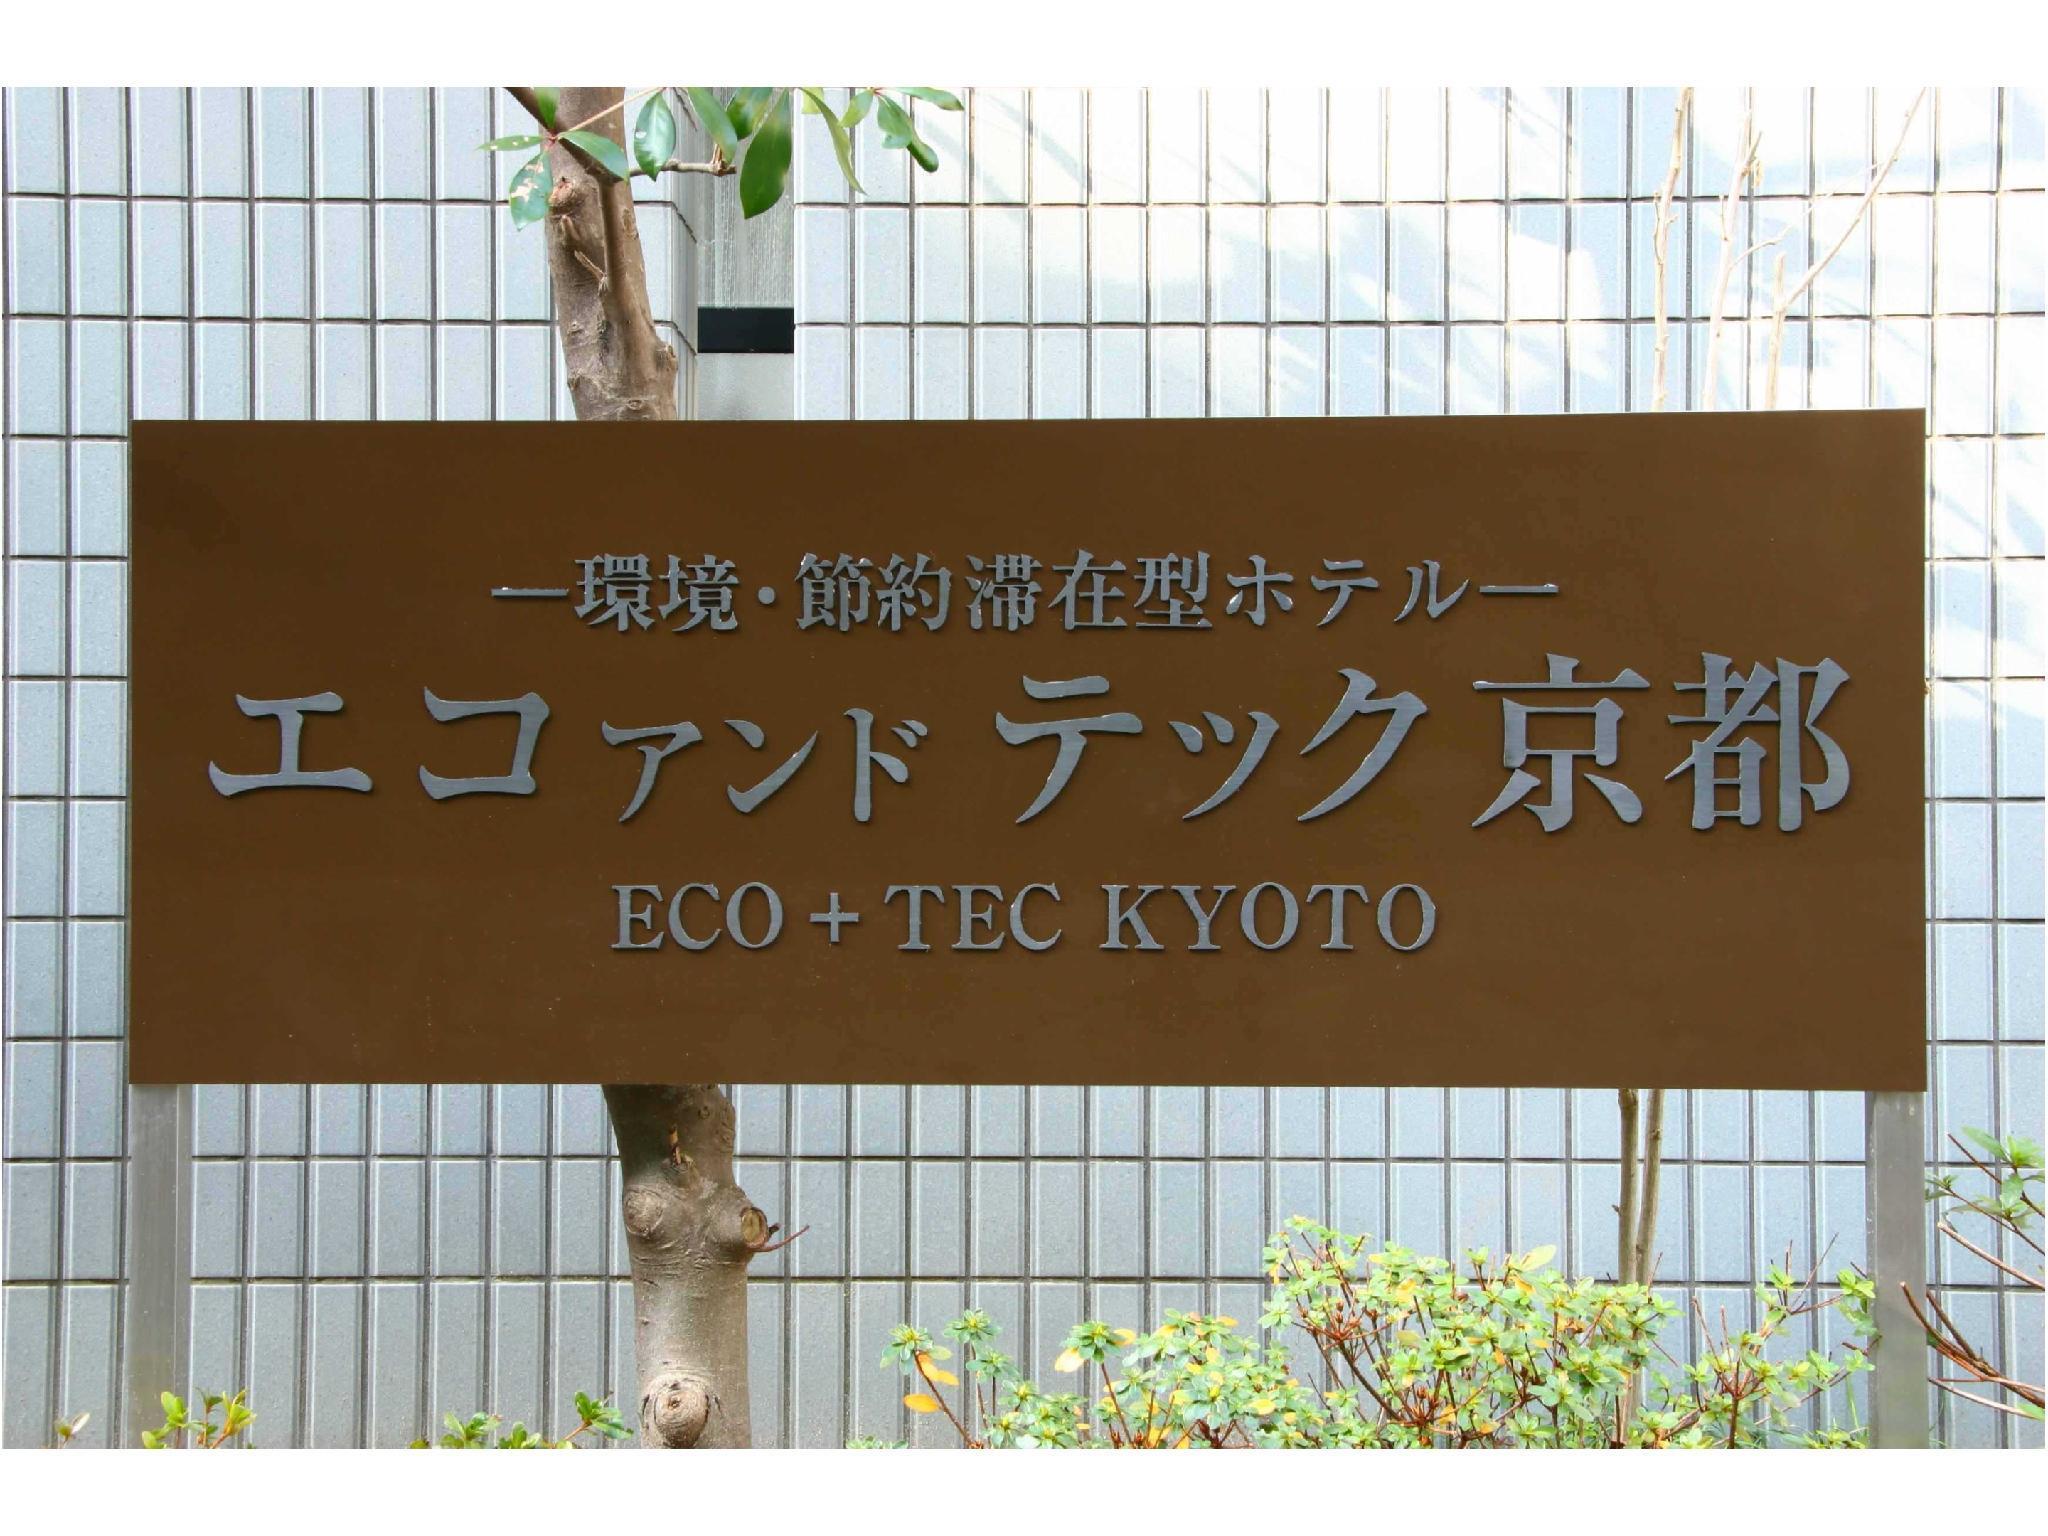 Eco And Tec Kyoto